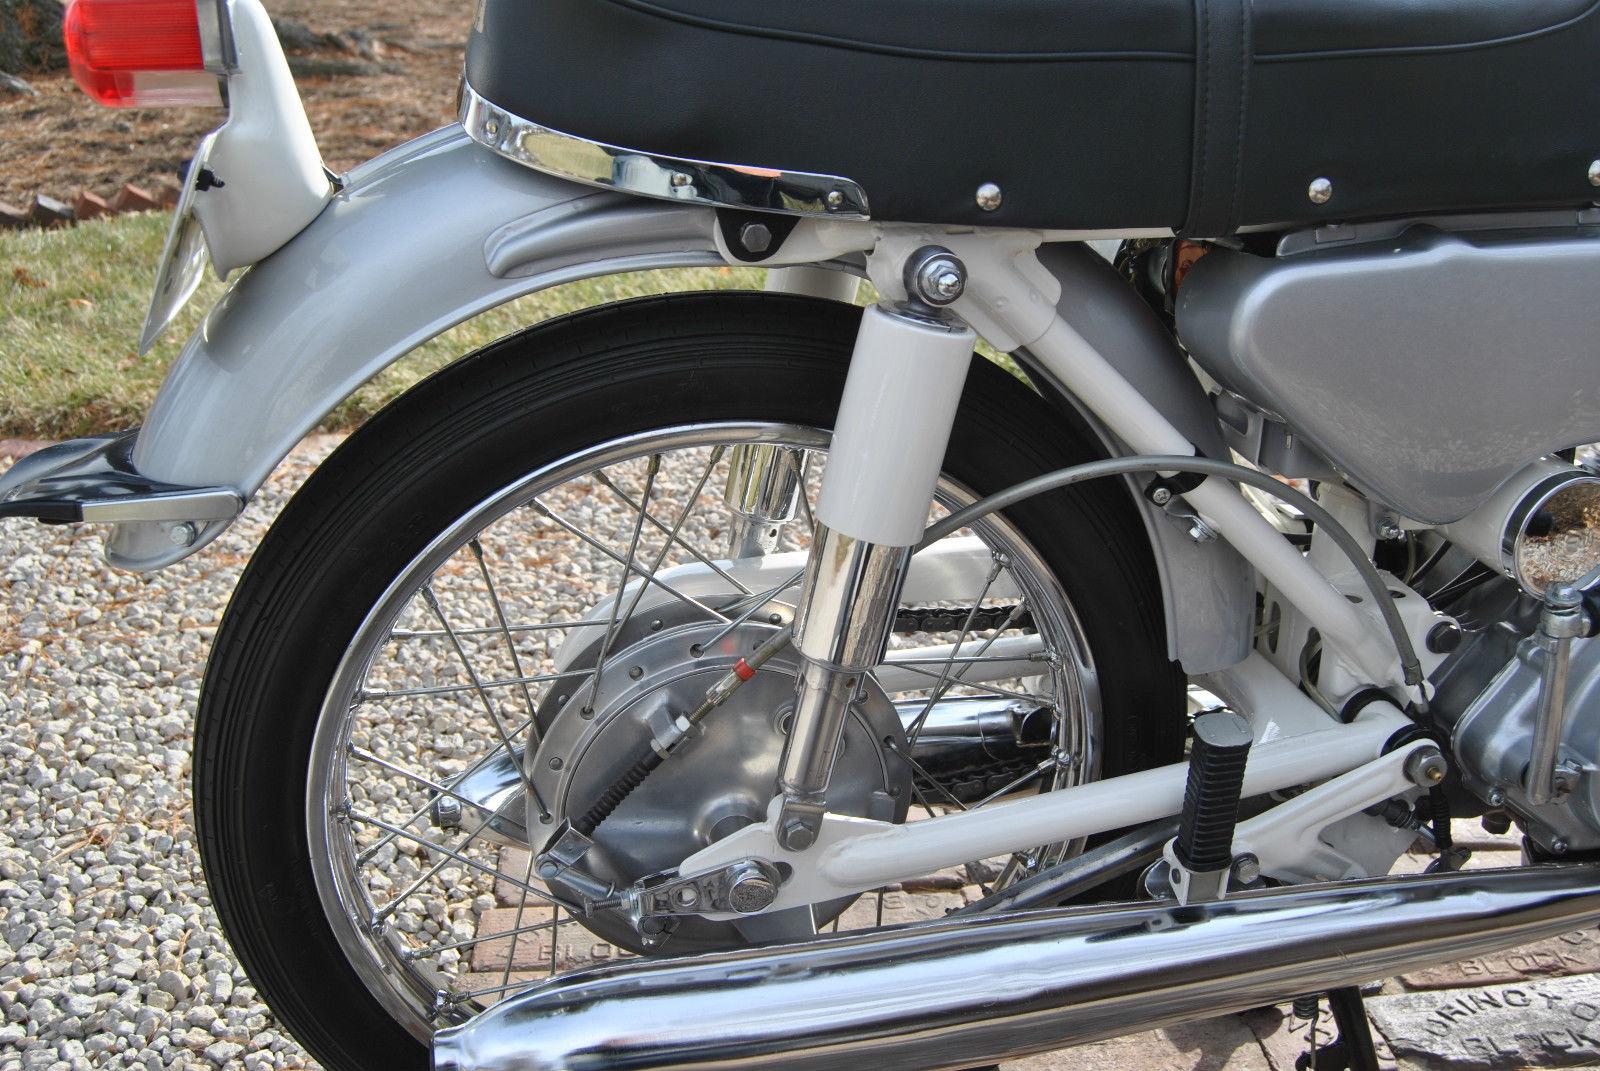 Honda CB160 Sport - 1969 - Rear Suspension, Rear Wheel and Exhaust.